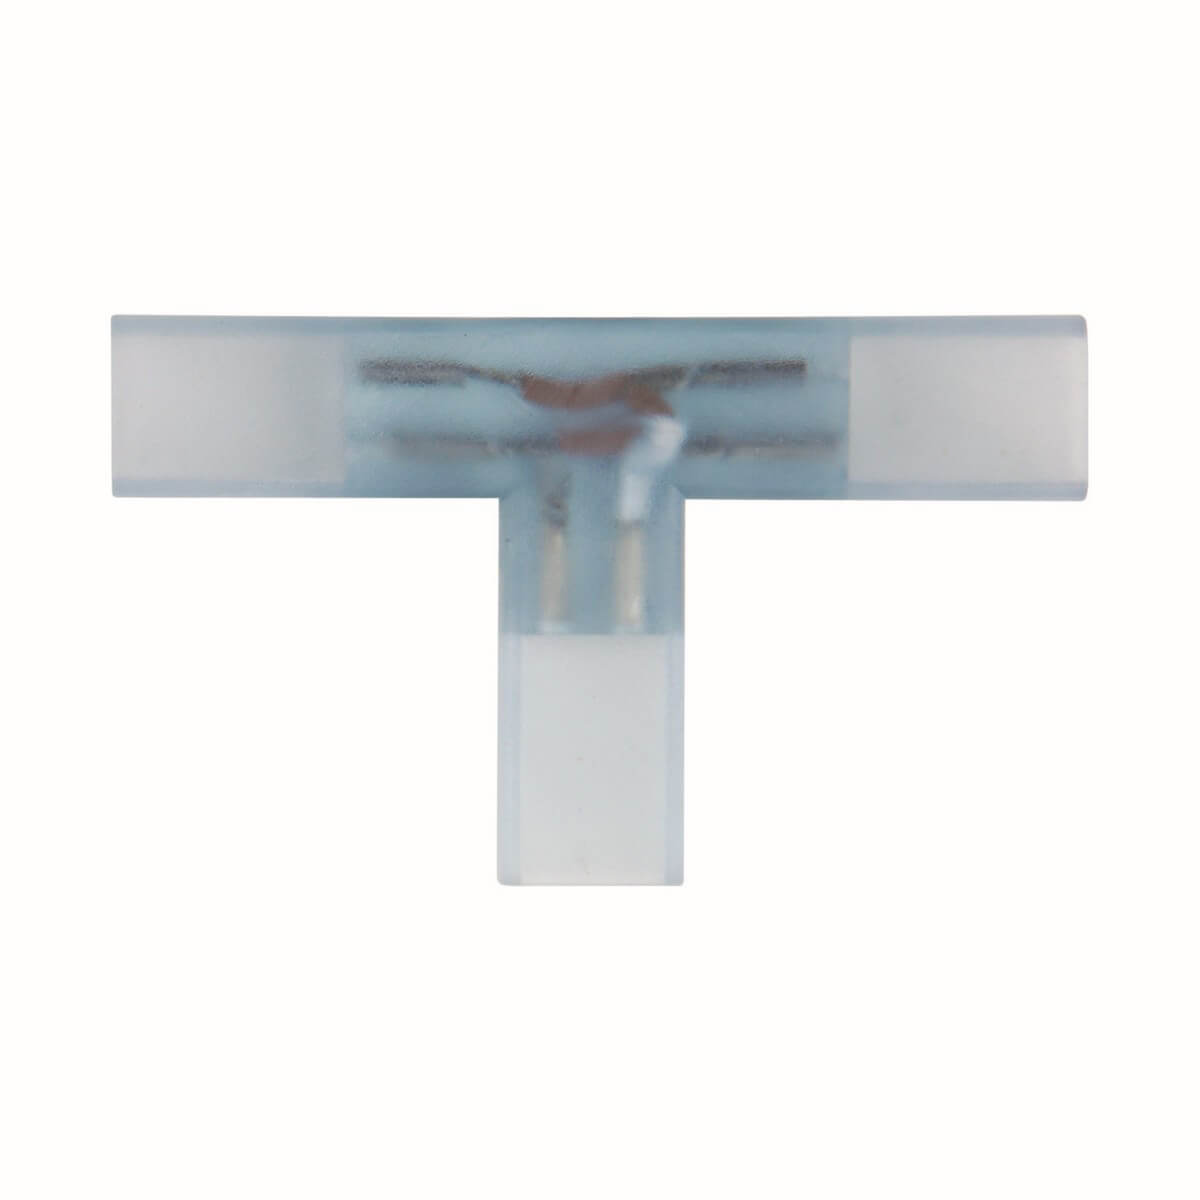 Клемма (10818) Uniel UTC-K-32/A67-NNN Clear 005 Polybag стоимость